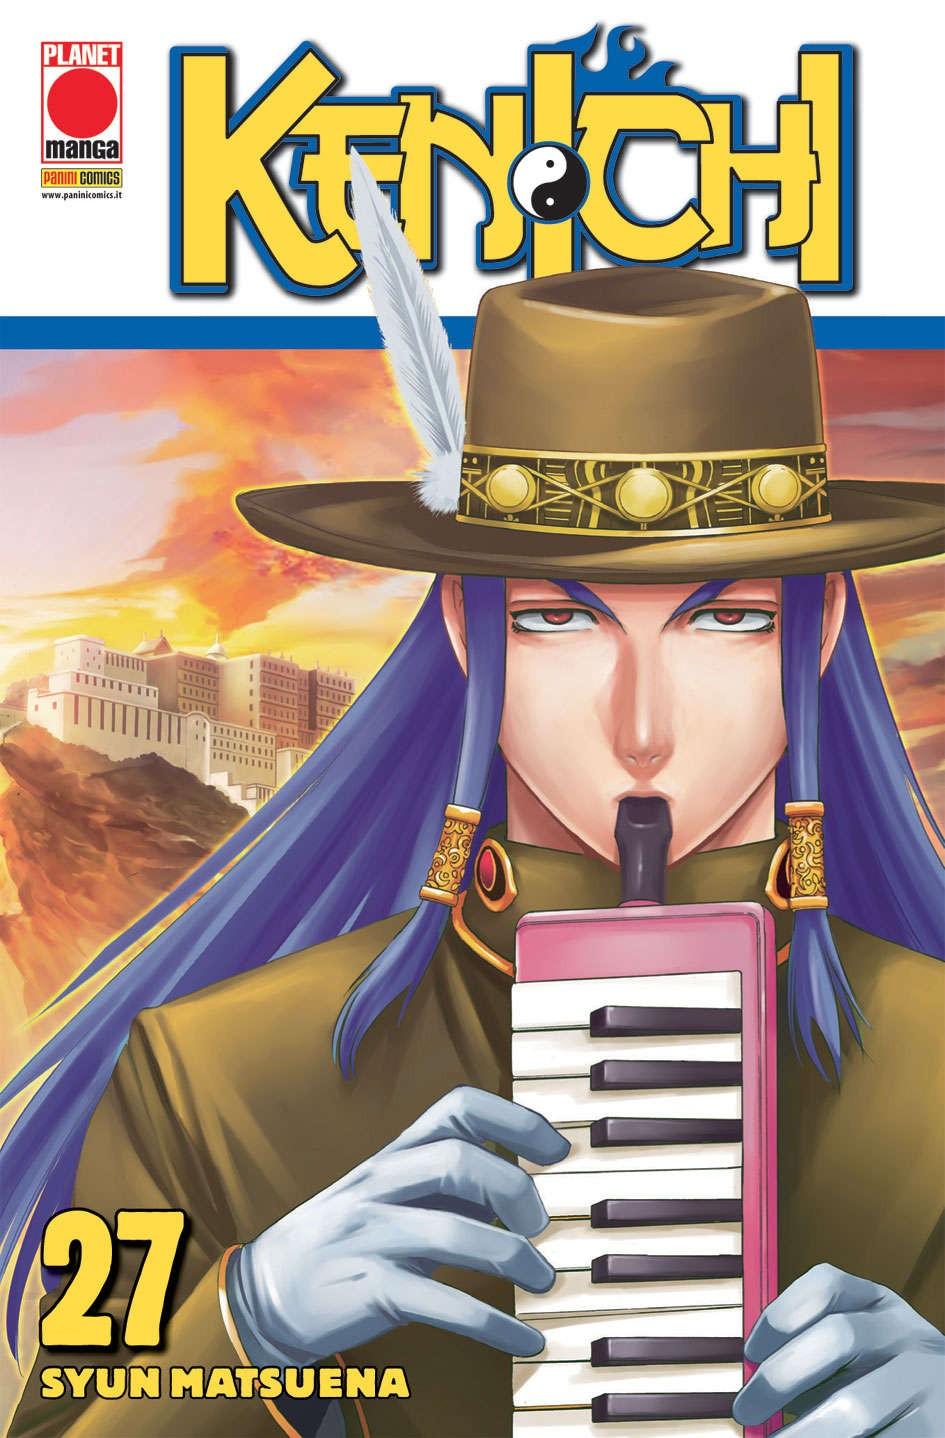 Kenichi - N° 27 - Kenichi - Planet Action Planet Manga